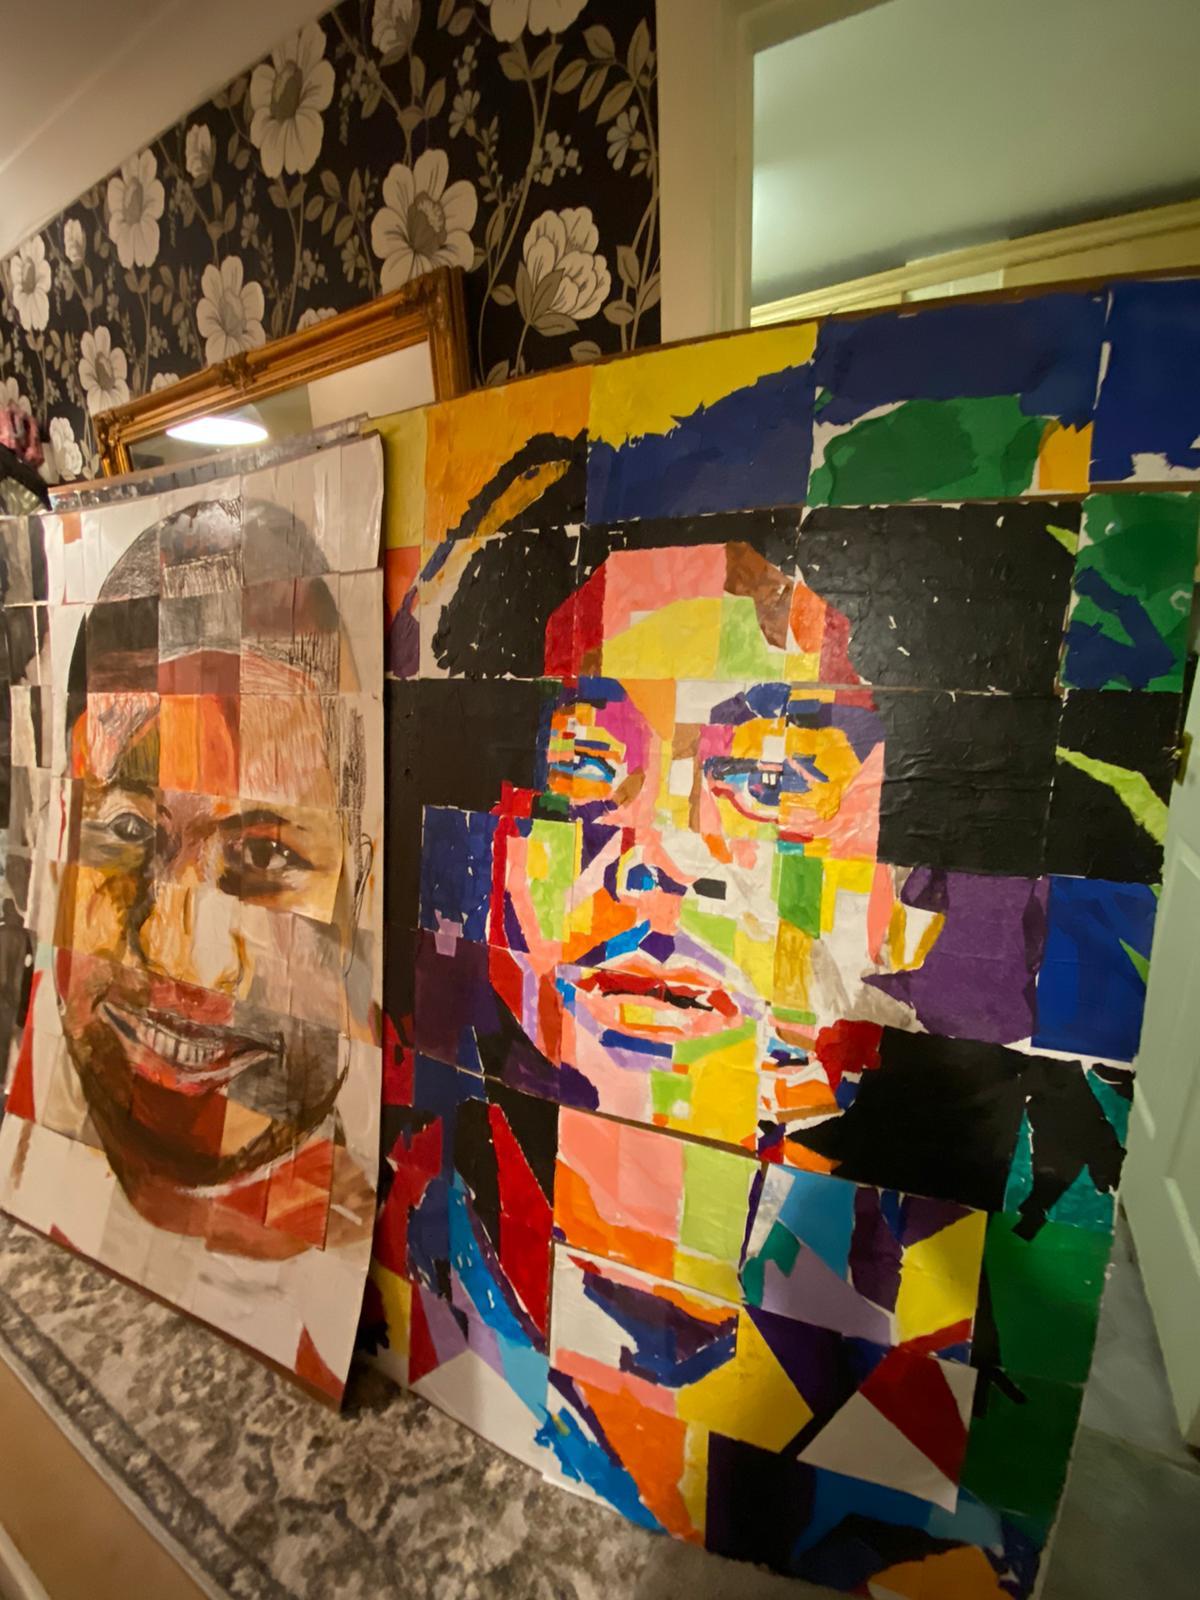 Gappy Ranks and Bob Marley